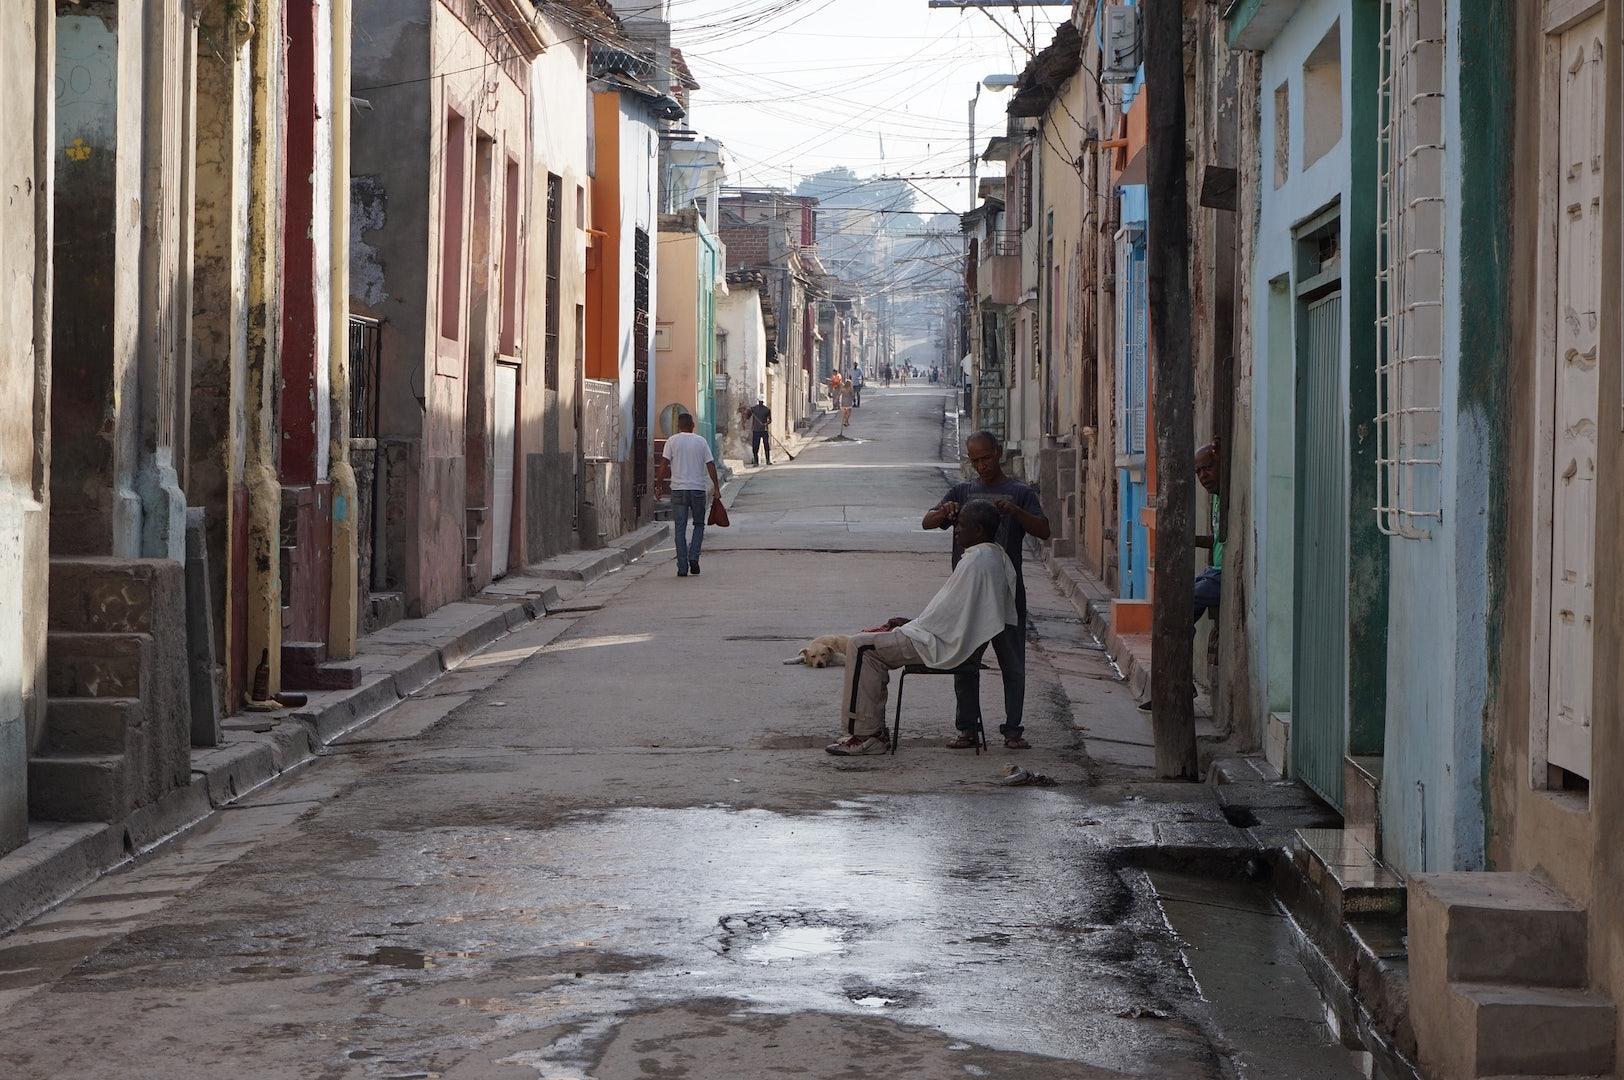 barber on the street in Havana